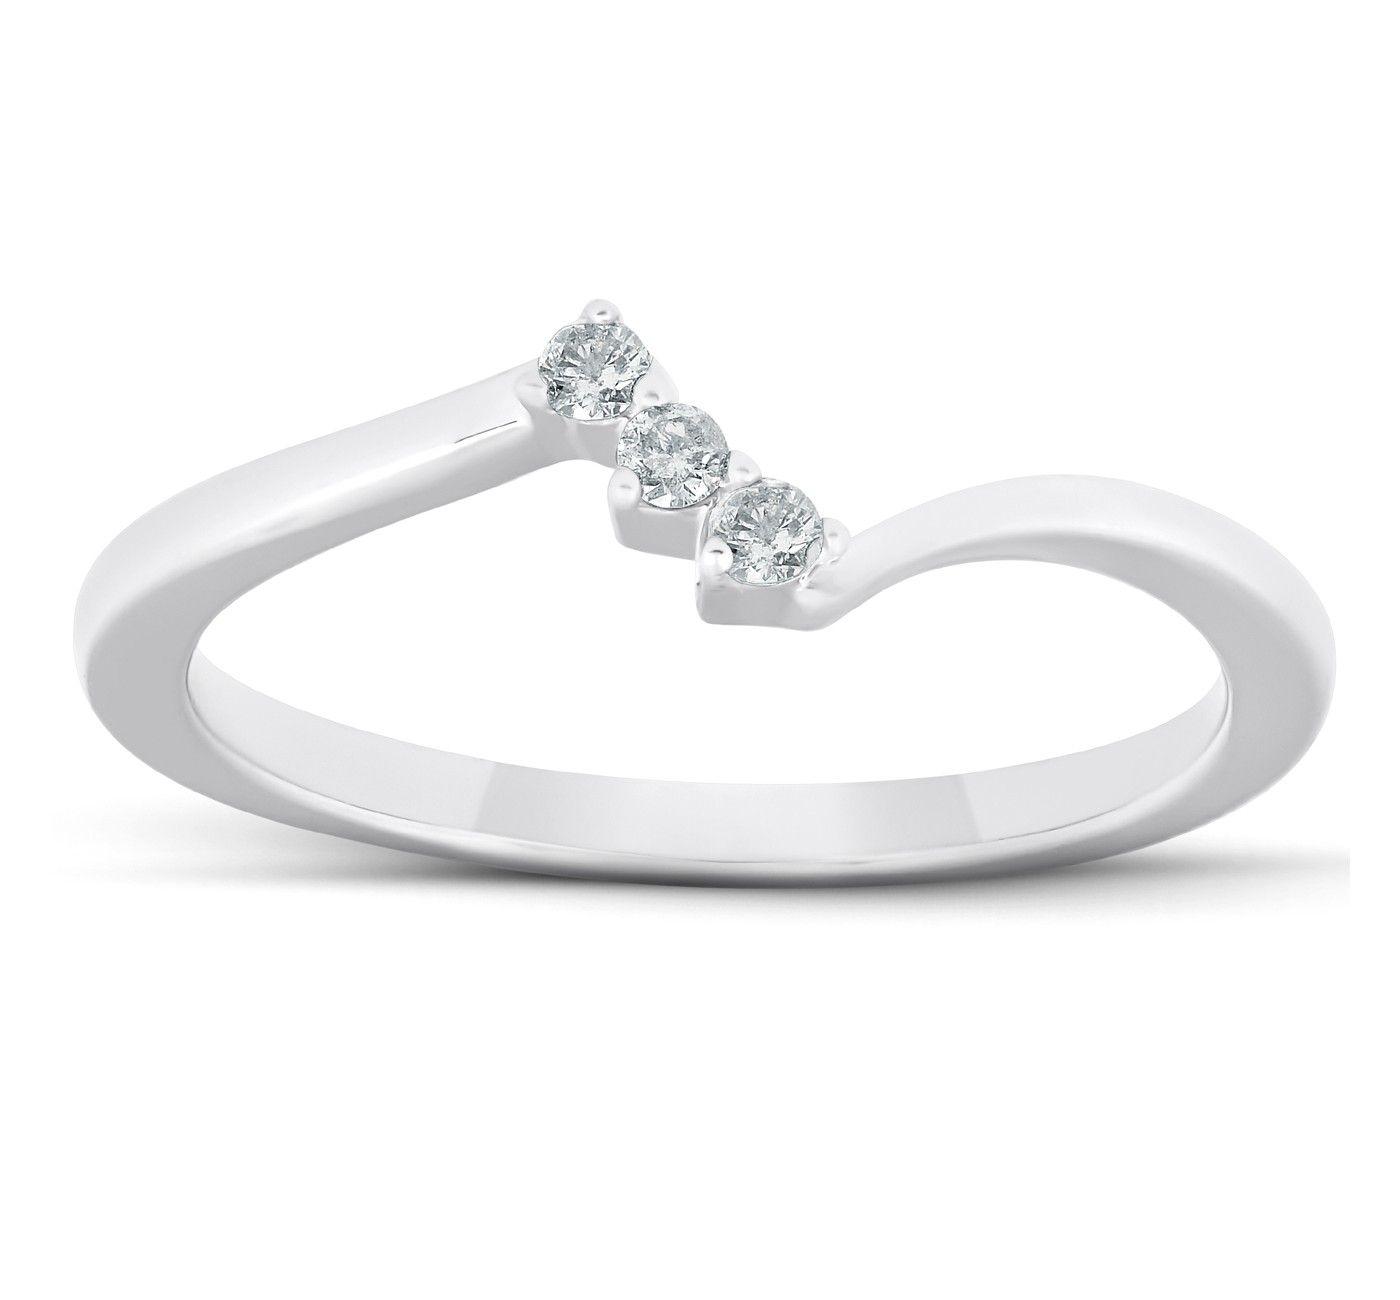 Pompeii3 1 2 Ct Marquise Diamond Engagement Trio Wedding Ring Set 10k White Gold Affiliate D Wedding Ring Trio Sets Wedding Ring Sets Wedding Rings Sets Gold